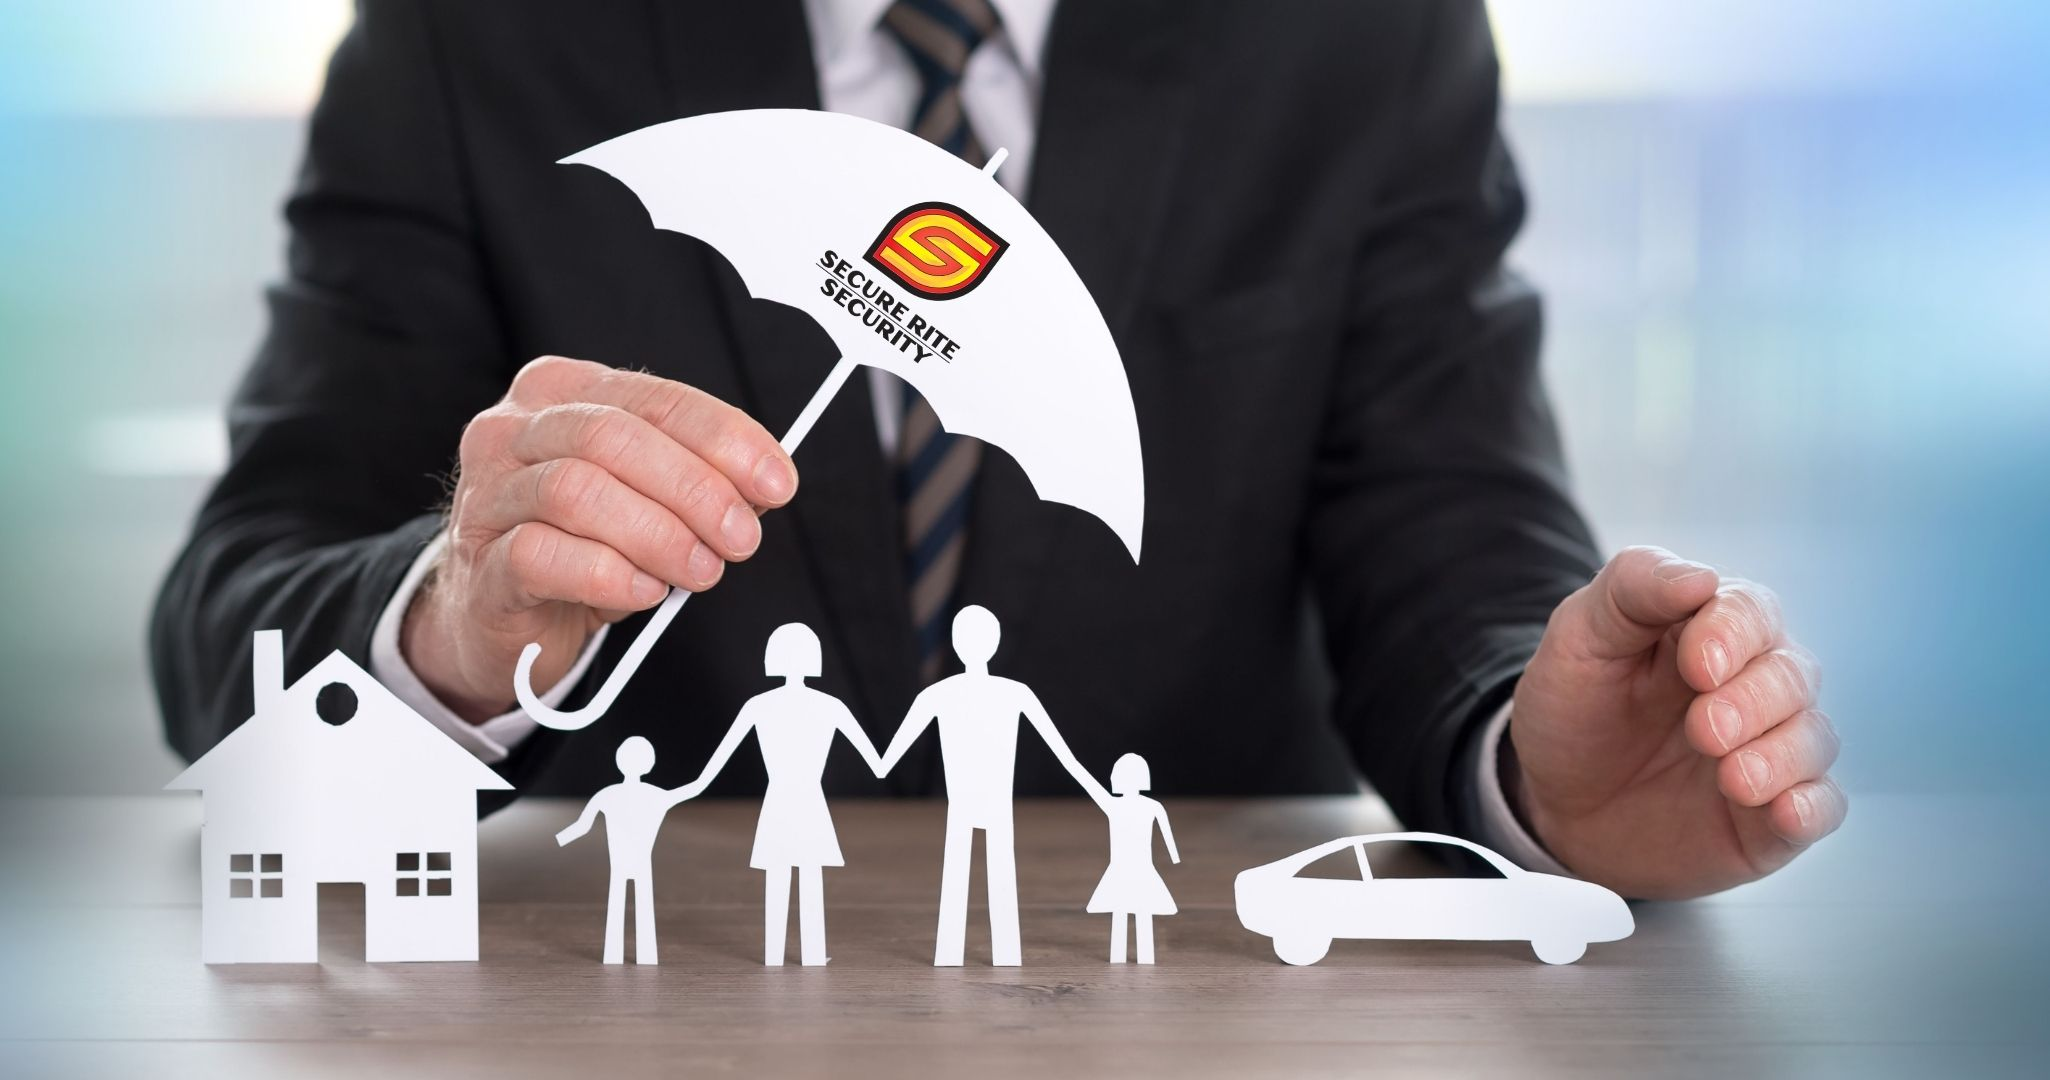 Short term insurance